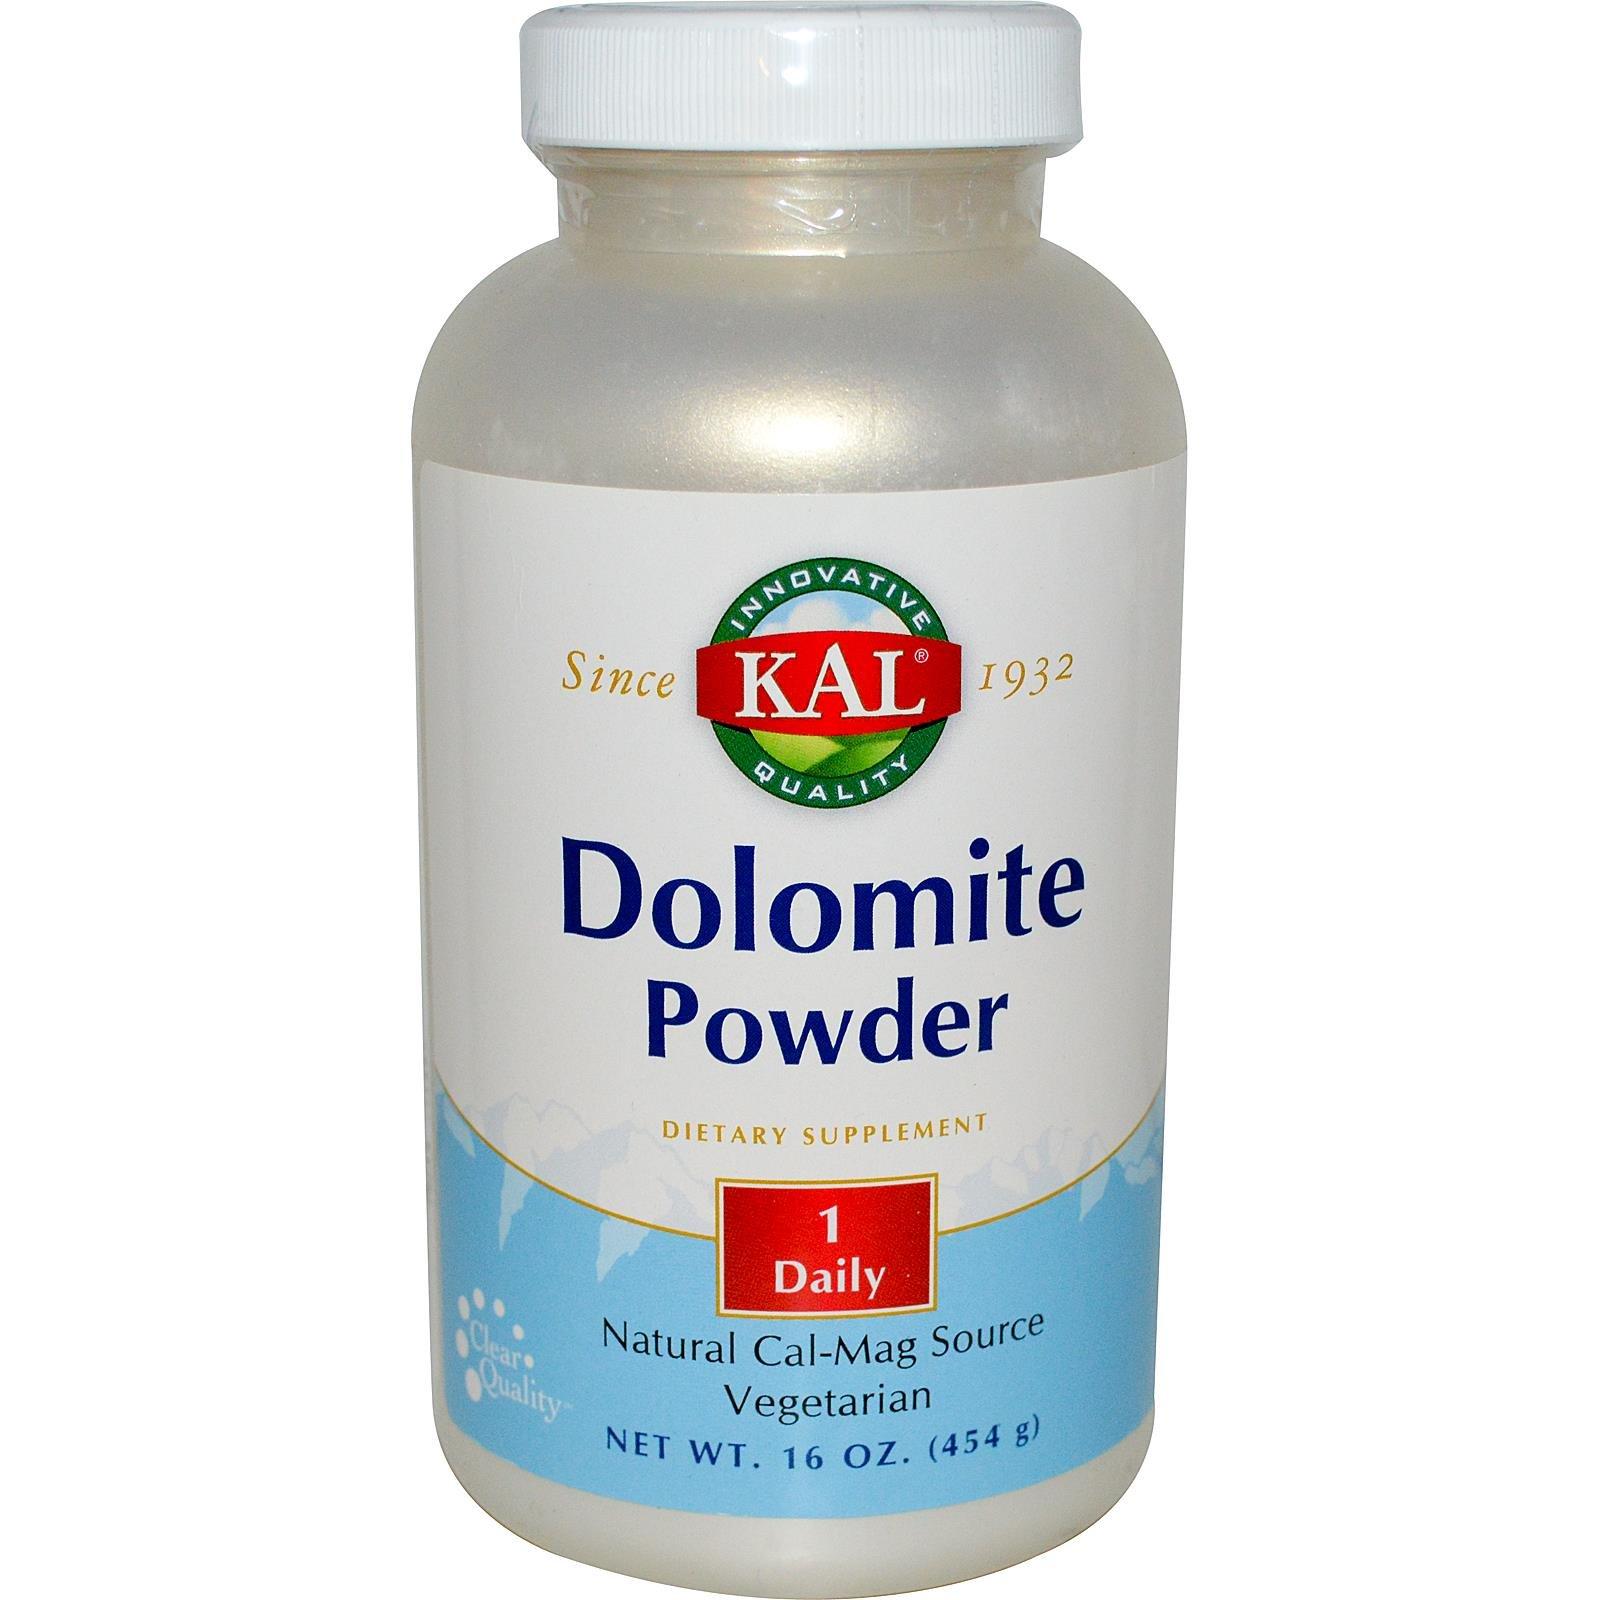 KAL, Dolomite Powder, 16 oz (454 g)